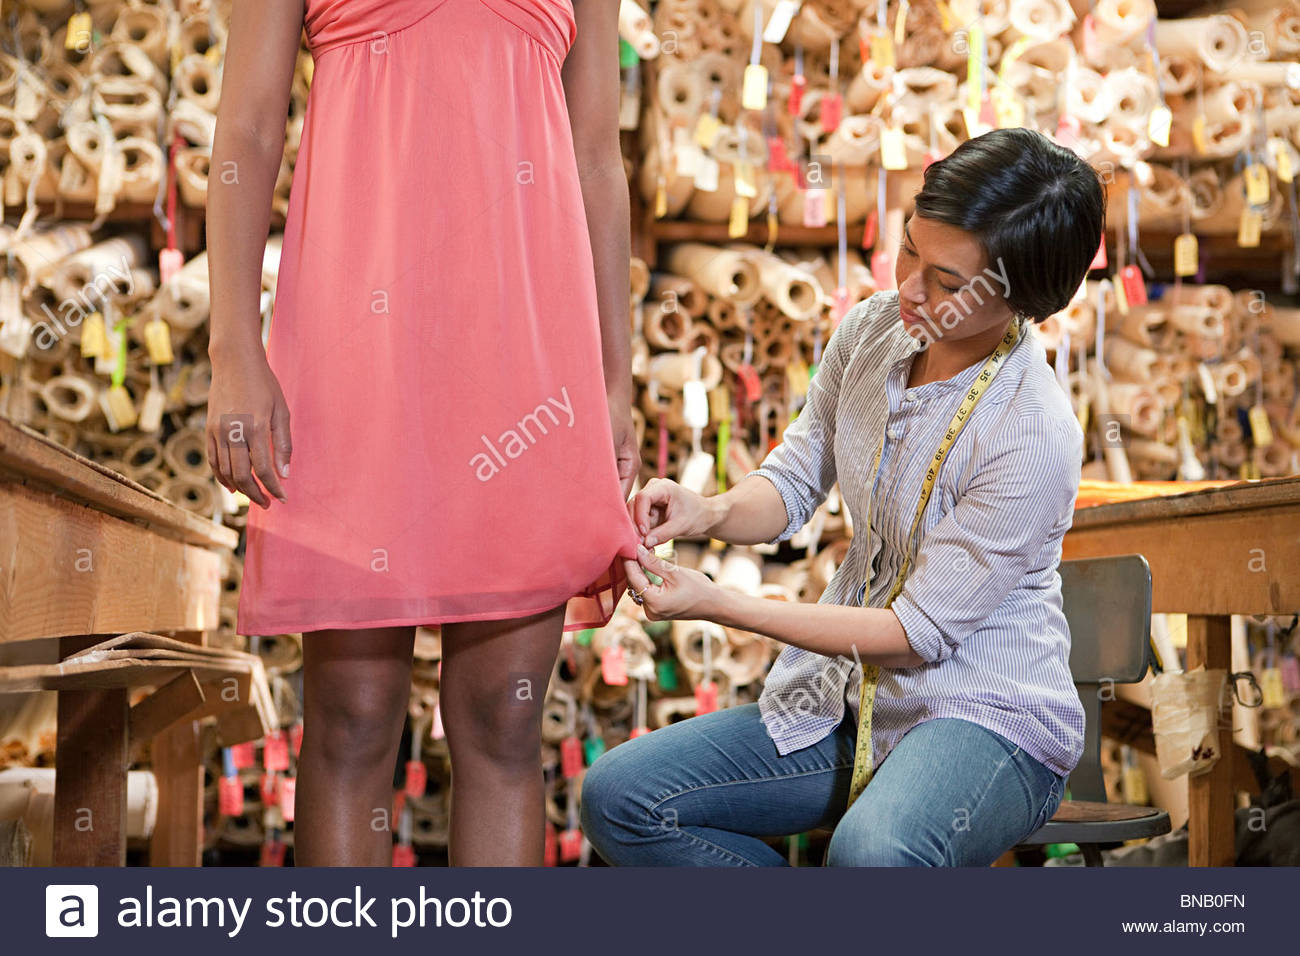 Seamstress adjusting dress on model - Stock Image